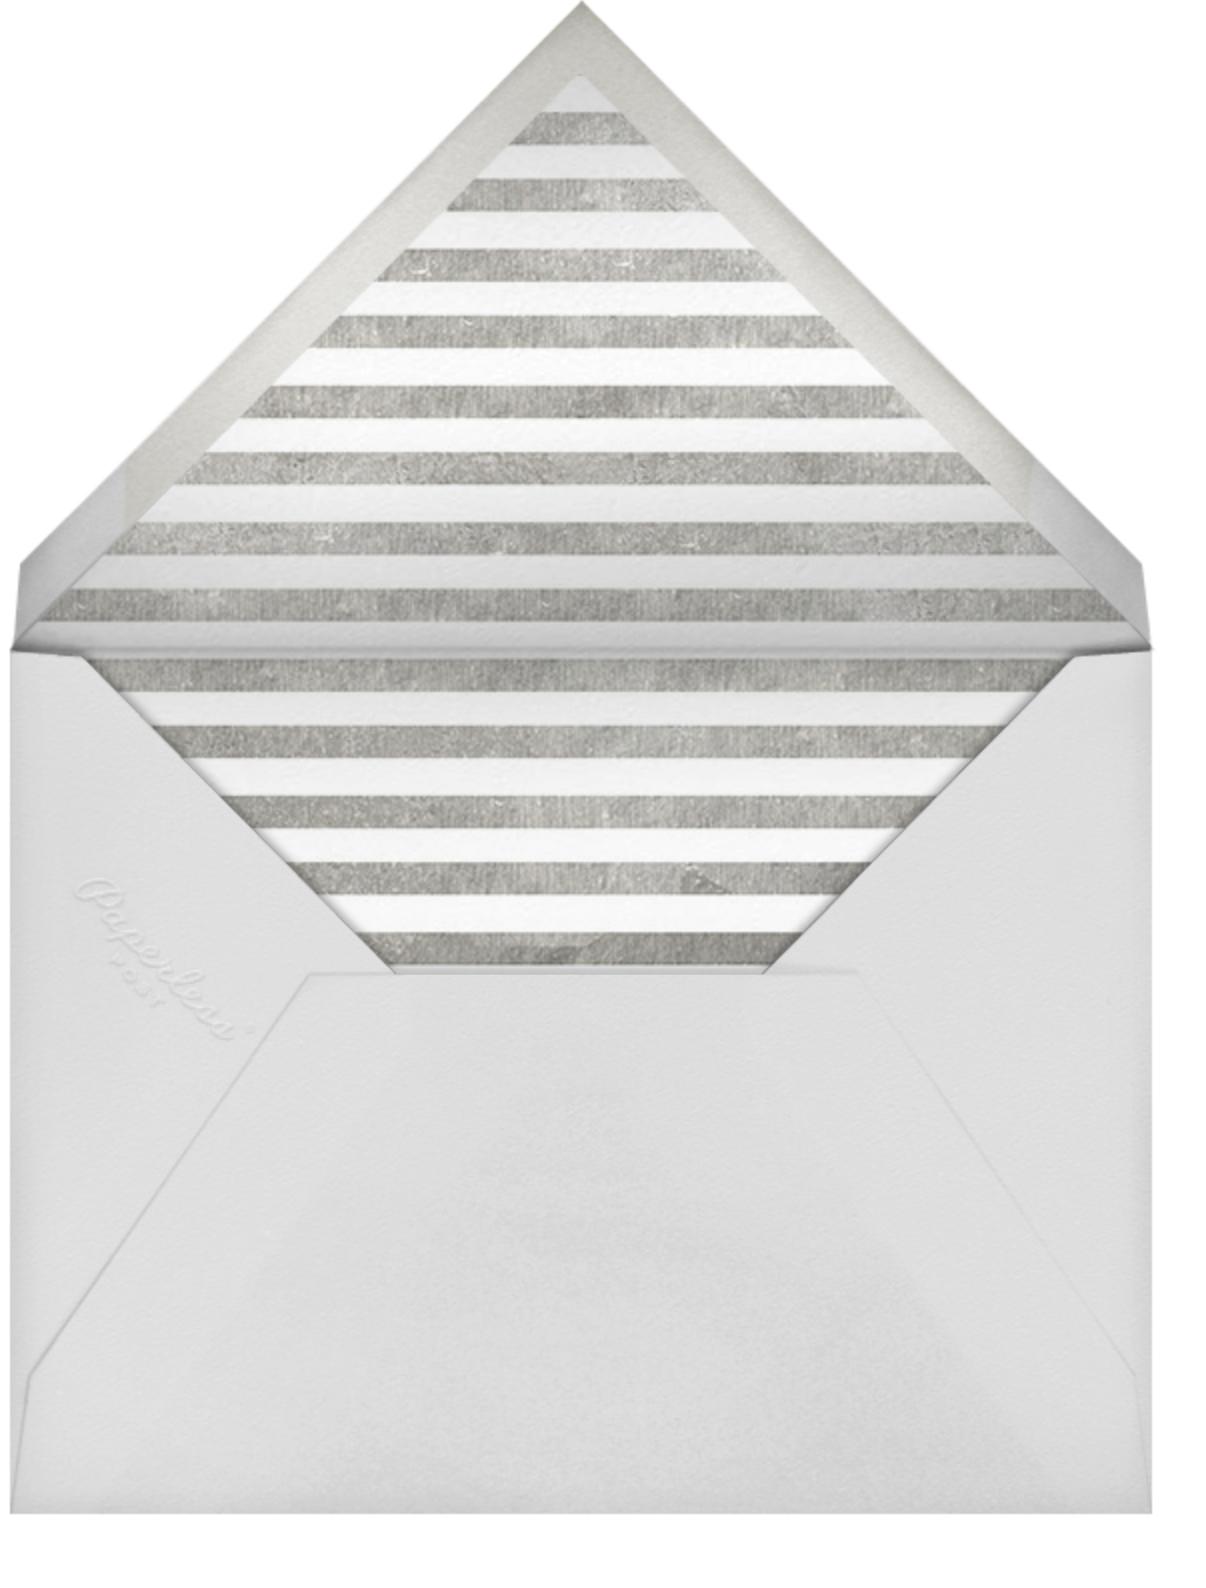 Confetti (Stationery) - Navy/Silver - kate spade new york - General - envelope back